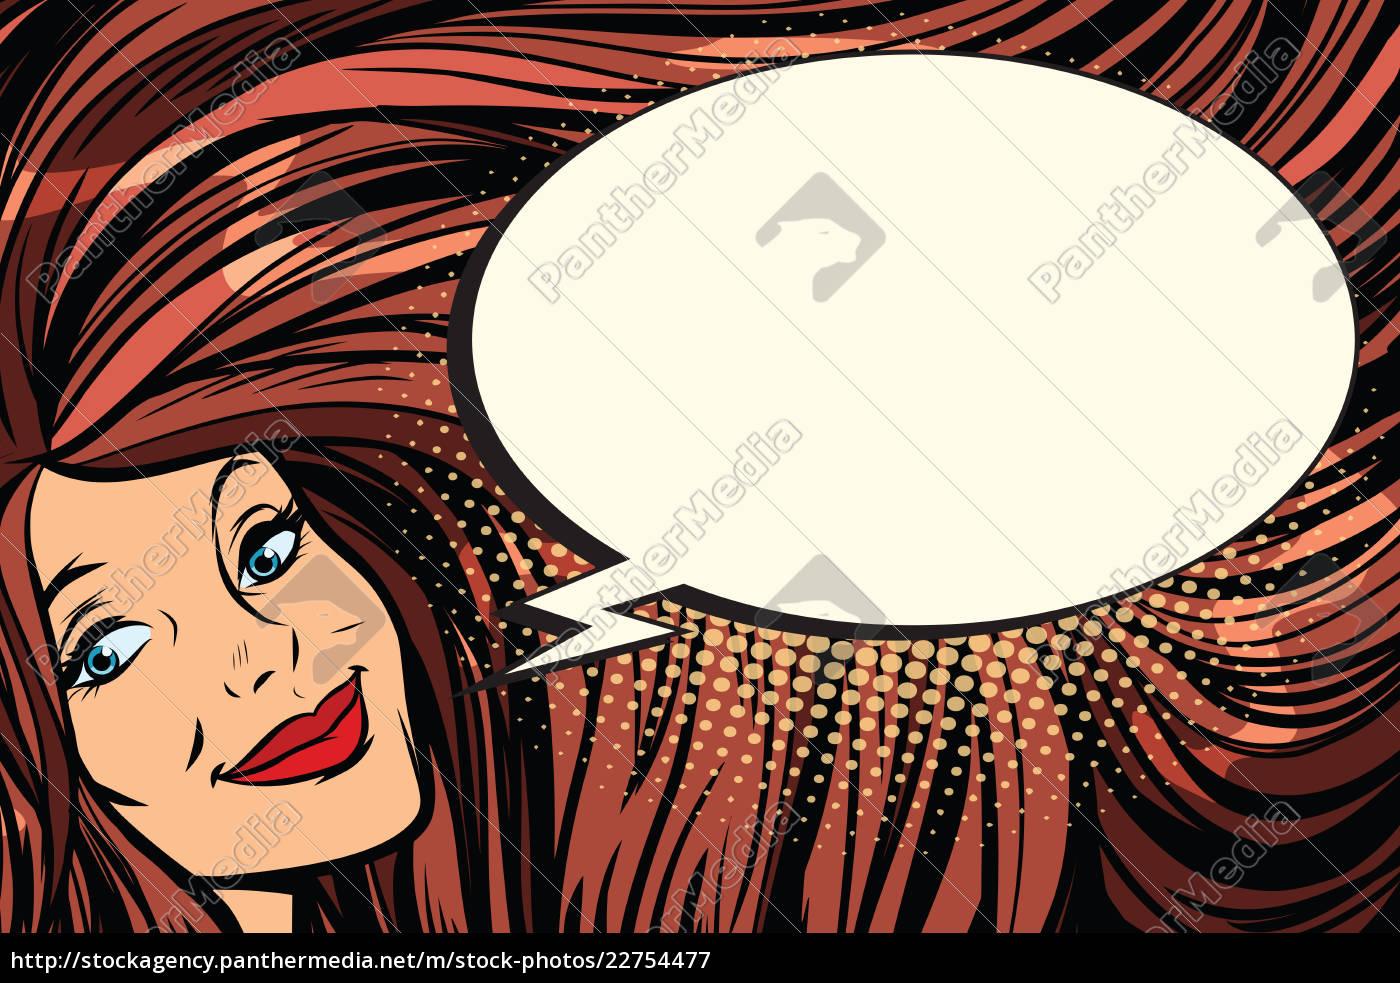 joyful, woman, with, long, hair, and - 22754477